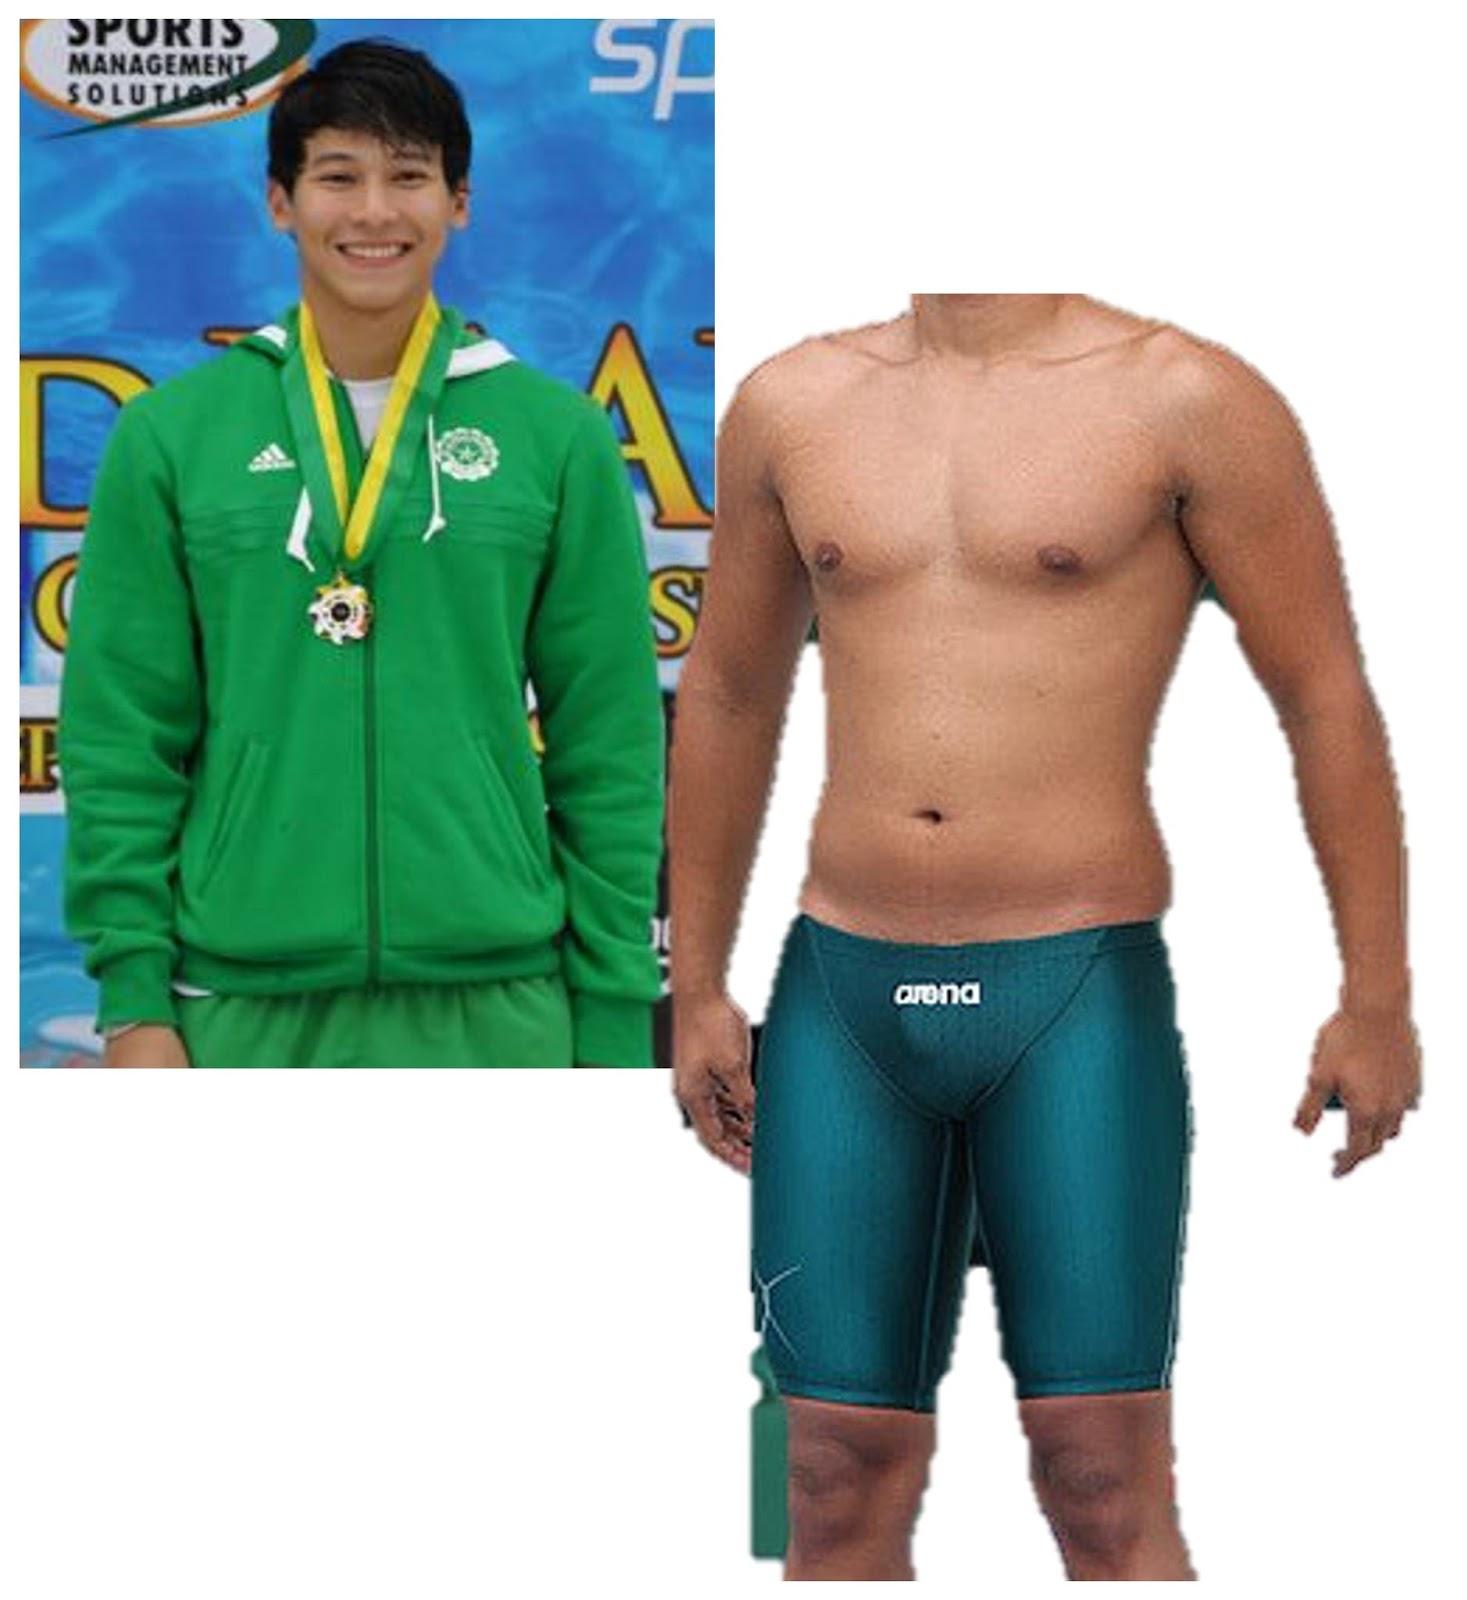 b8655f22dd Enchong Dee for arena swimwear, TIMEX IRONMAN TRIATHLON watch and Havaianas  flip-flop combo